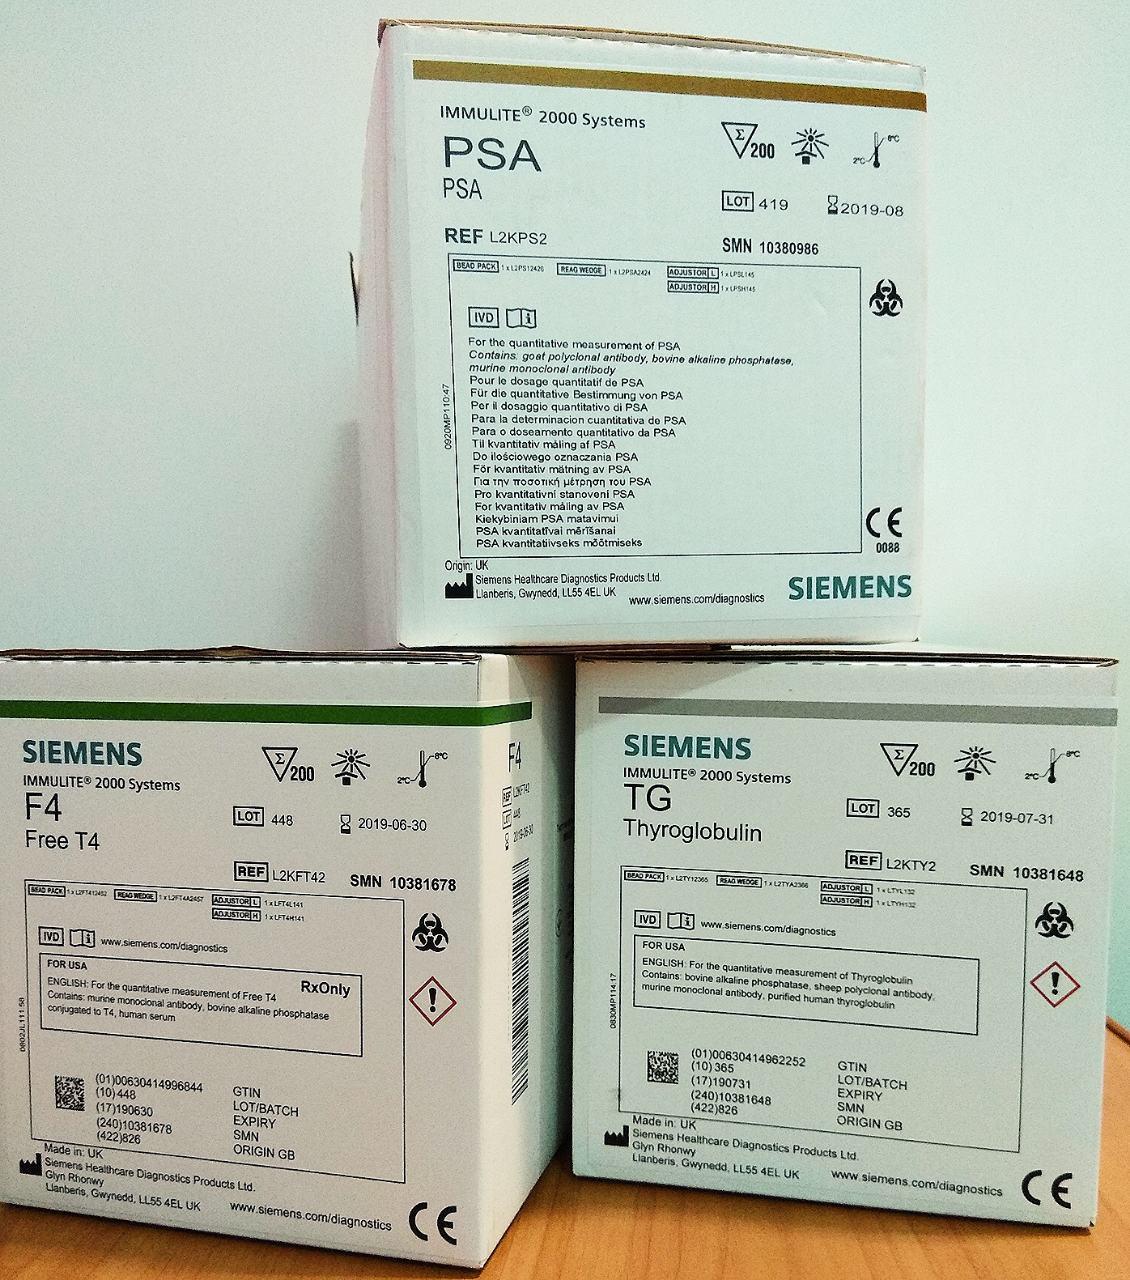 Insulin Sample Diluent SIEMENS IMMULITE 2000